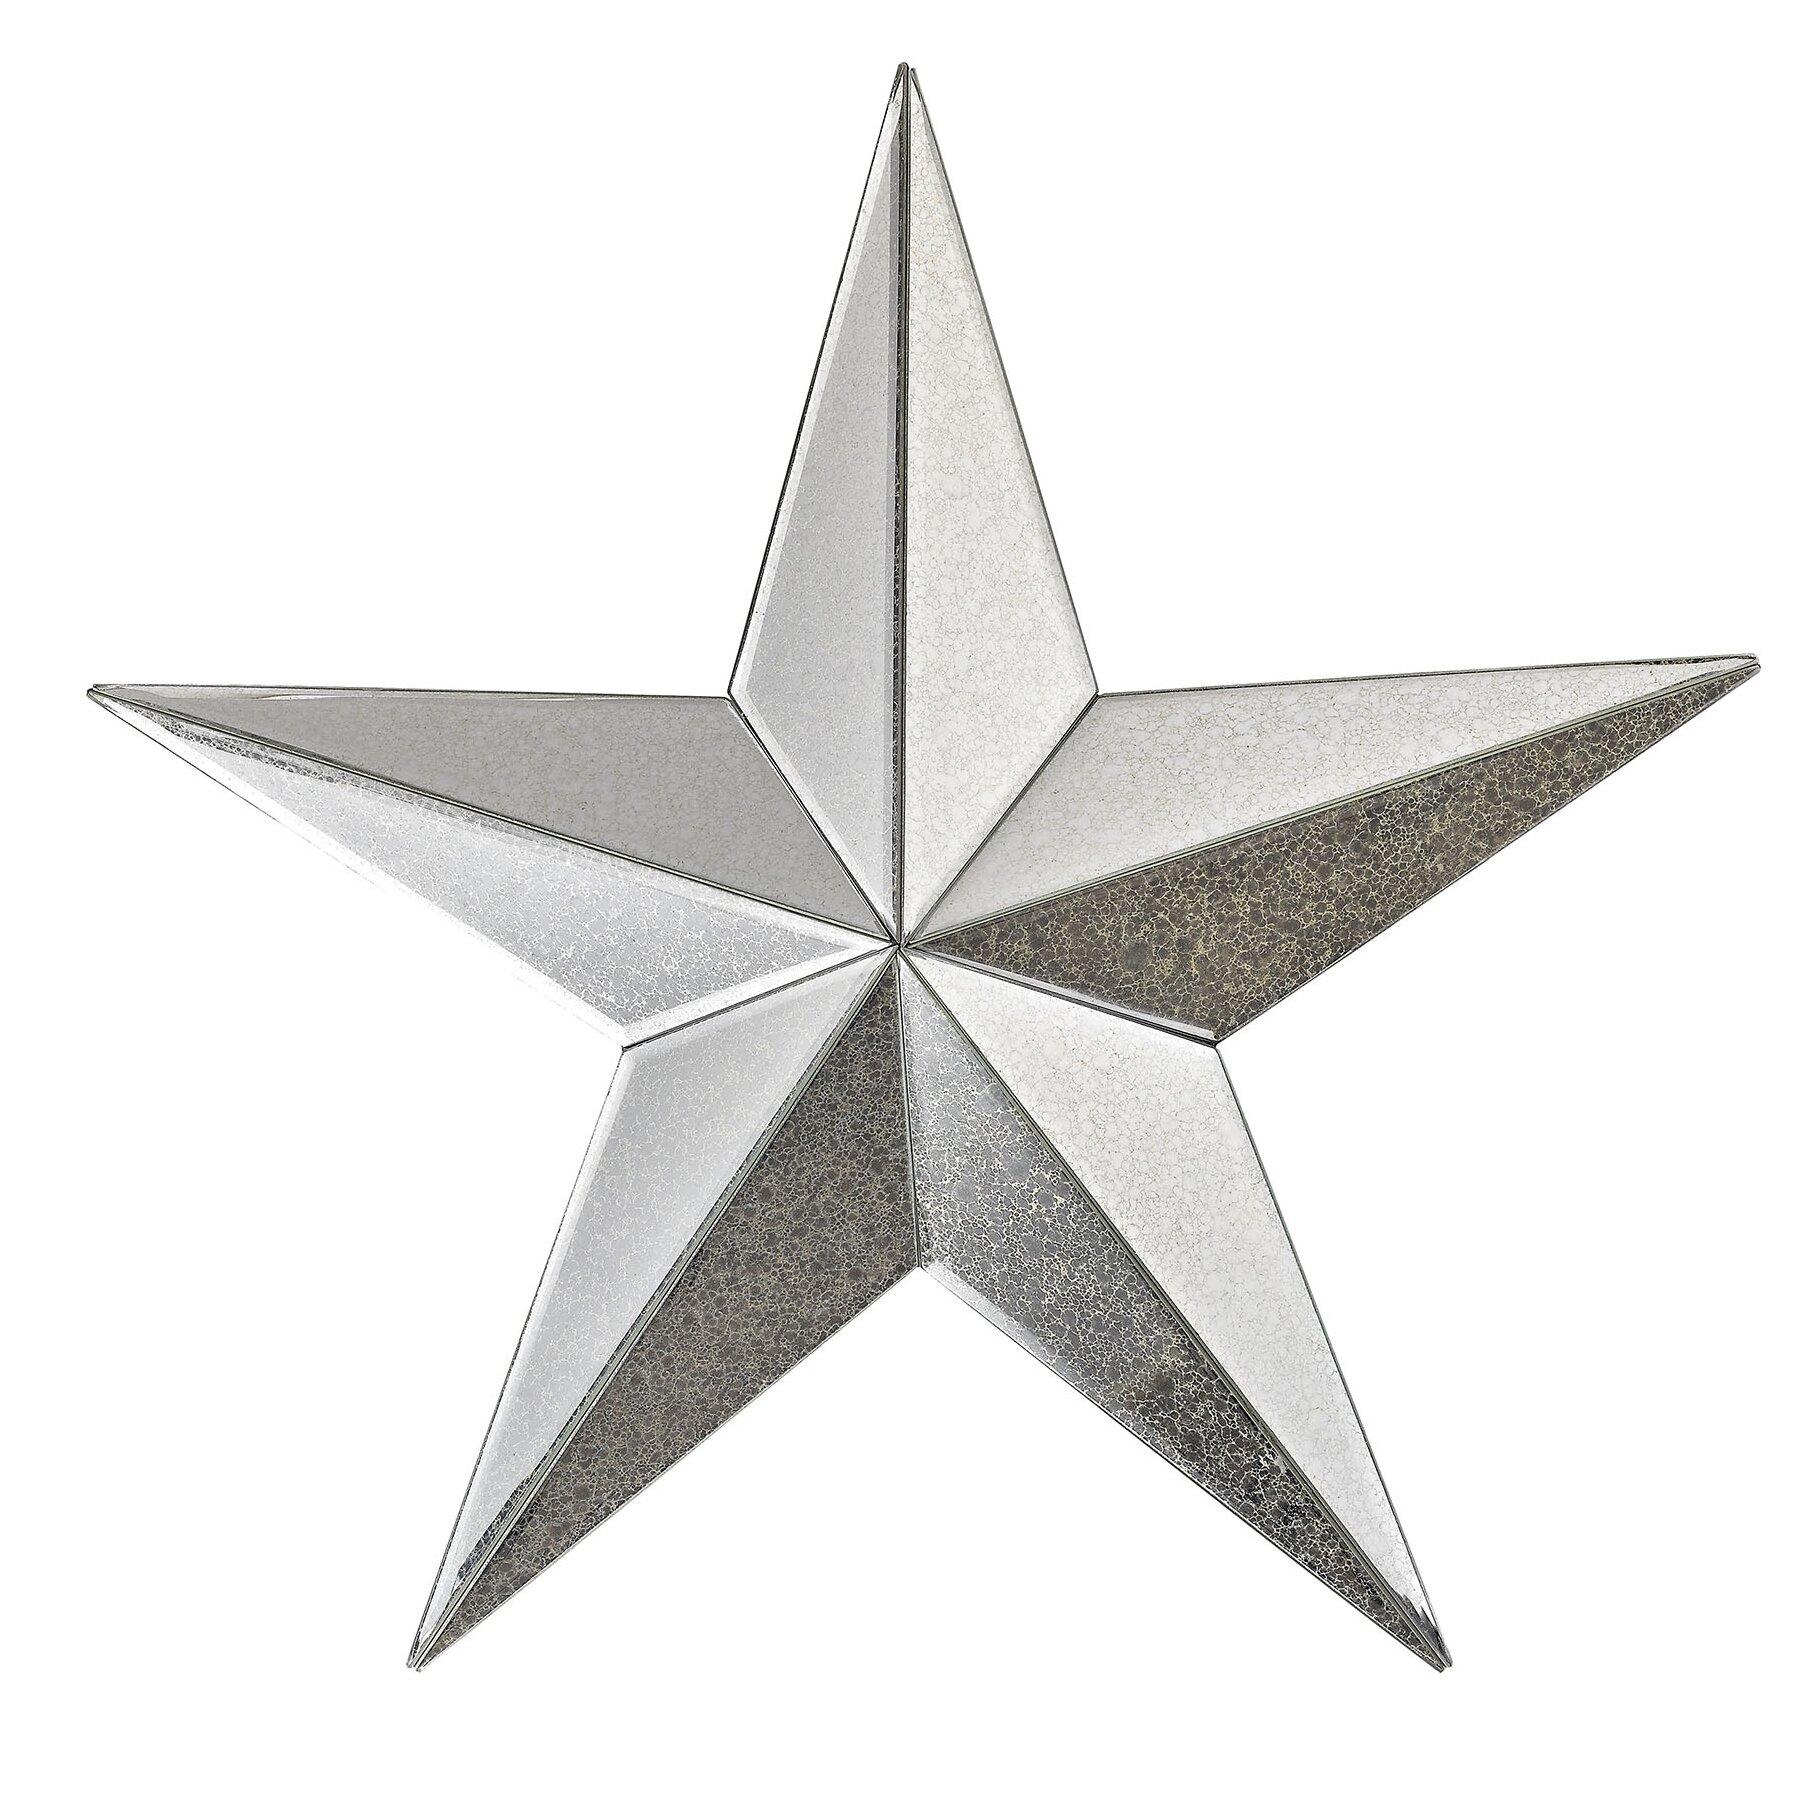 Mirrored Star Wall Decor